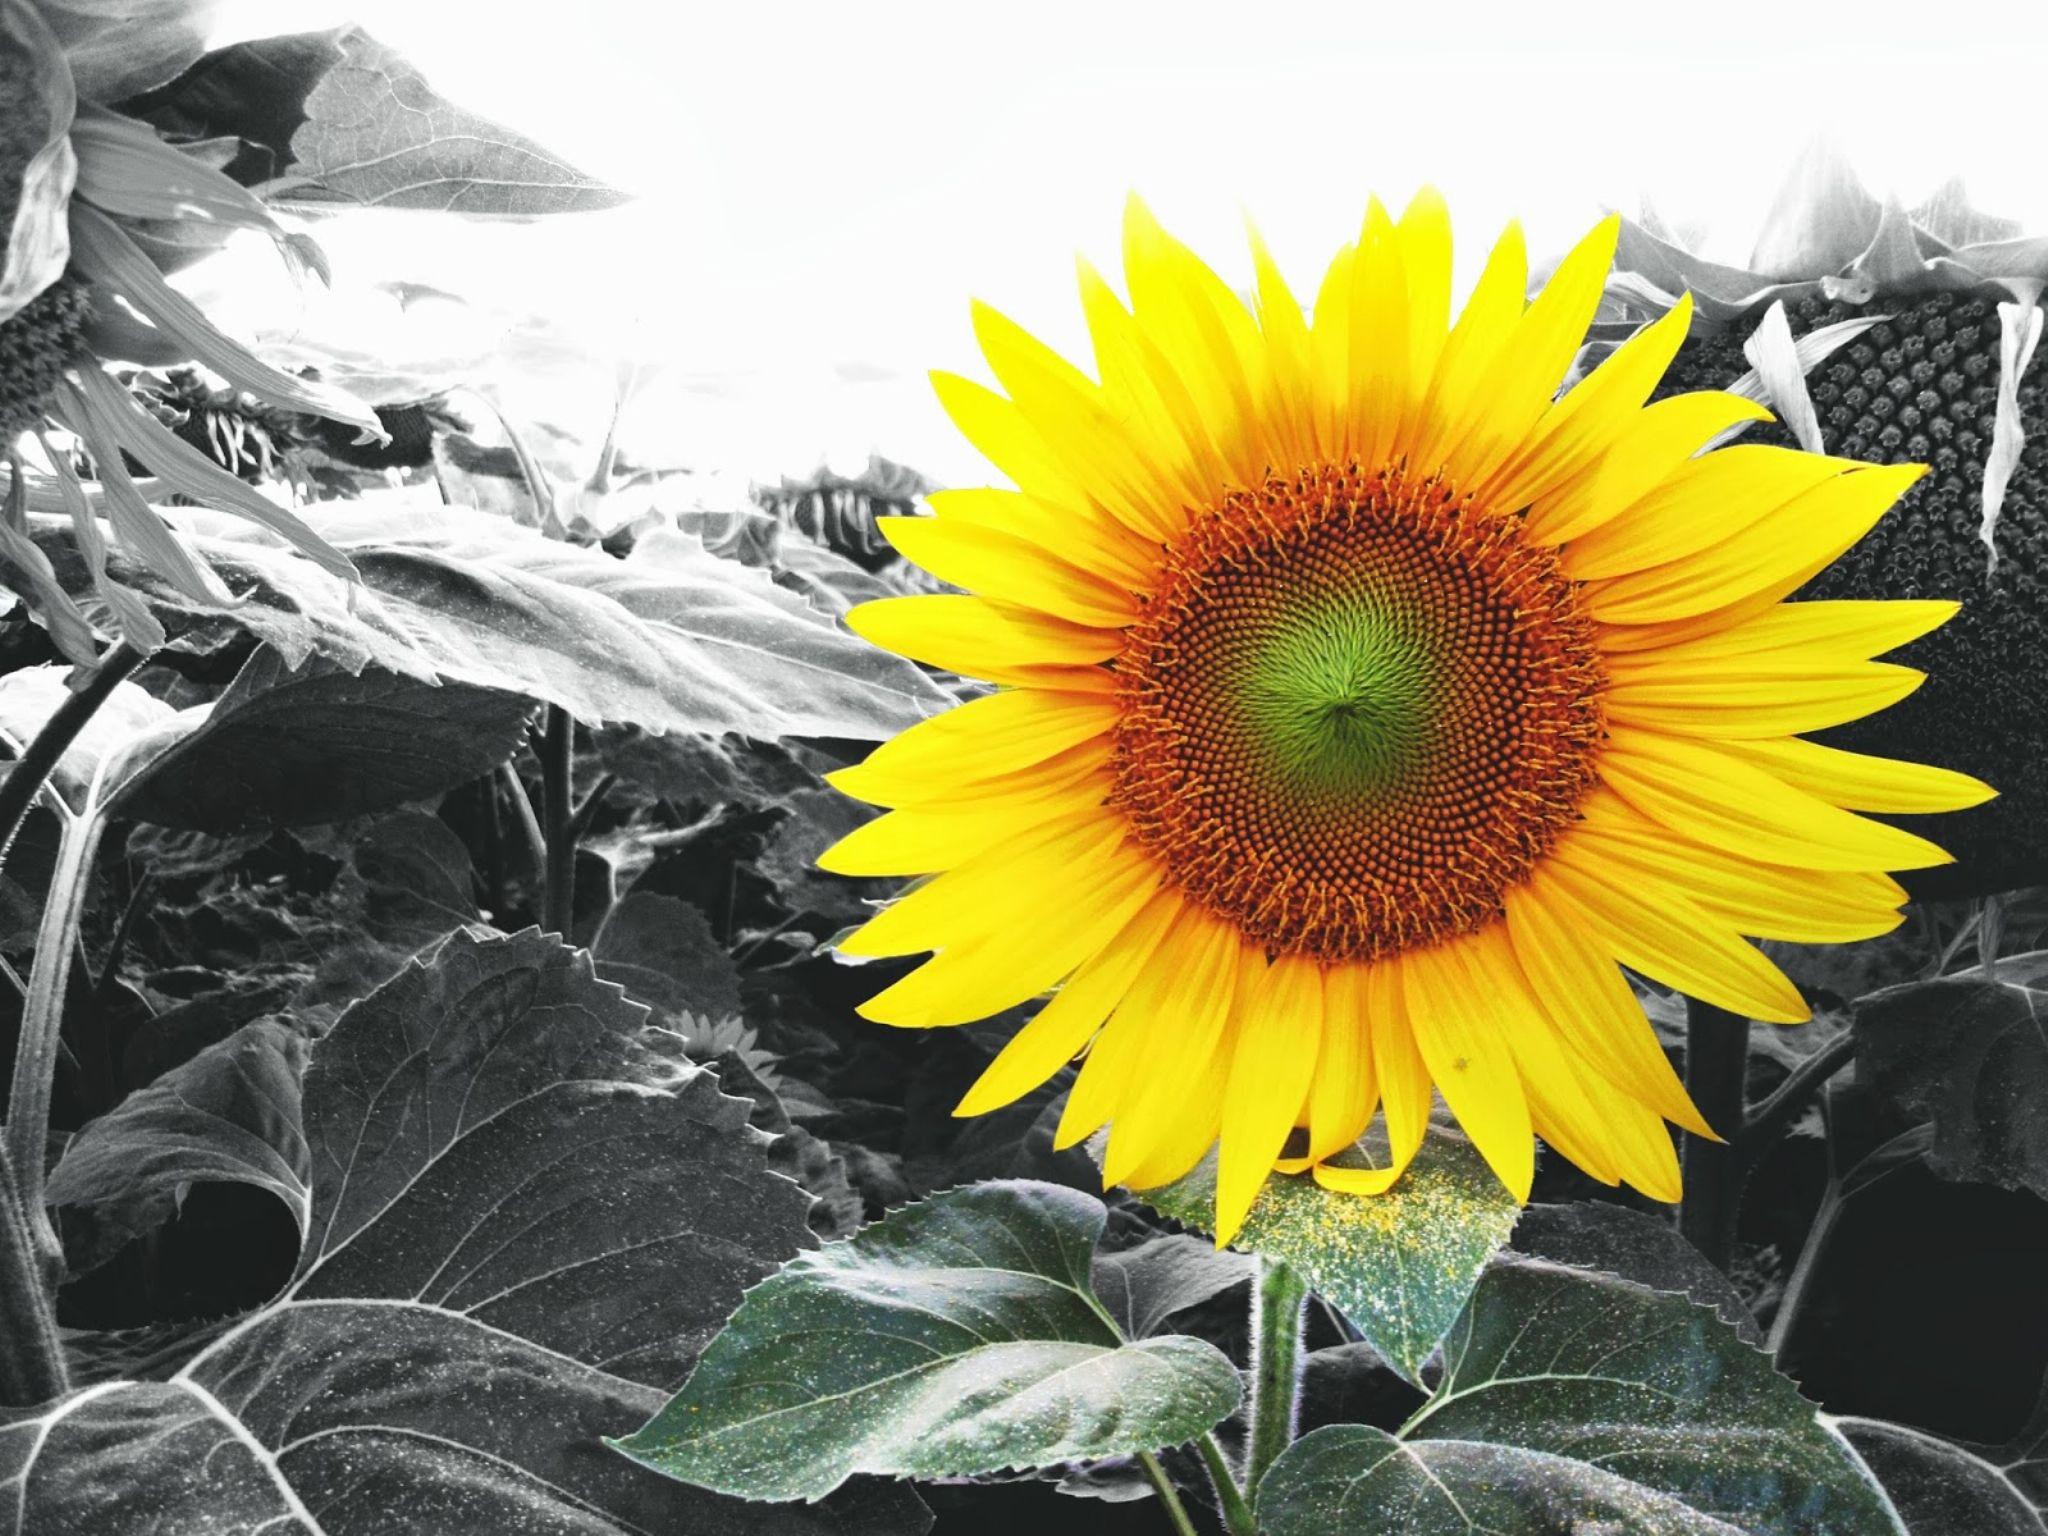 Sunflower by Josip Kos